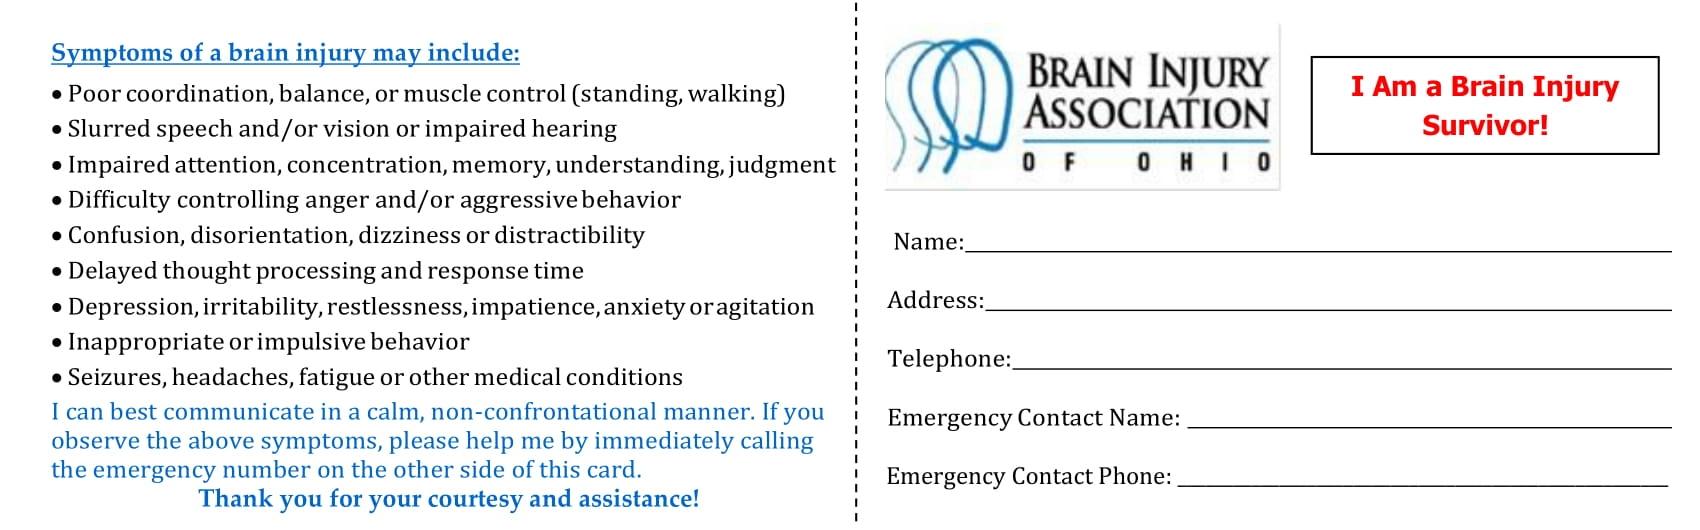 Survivor card No Physician Signature PDF-1.jpg